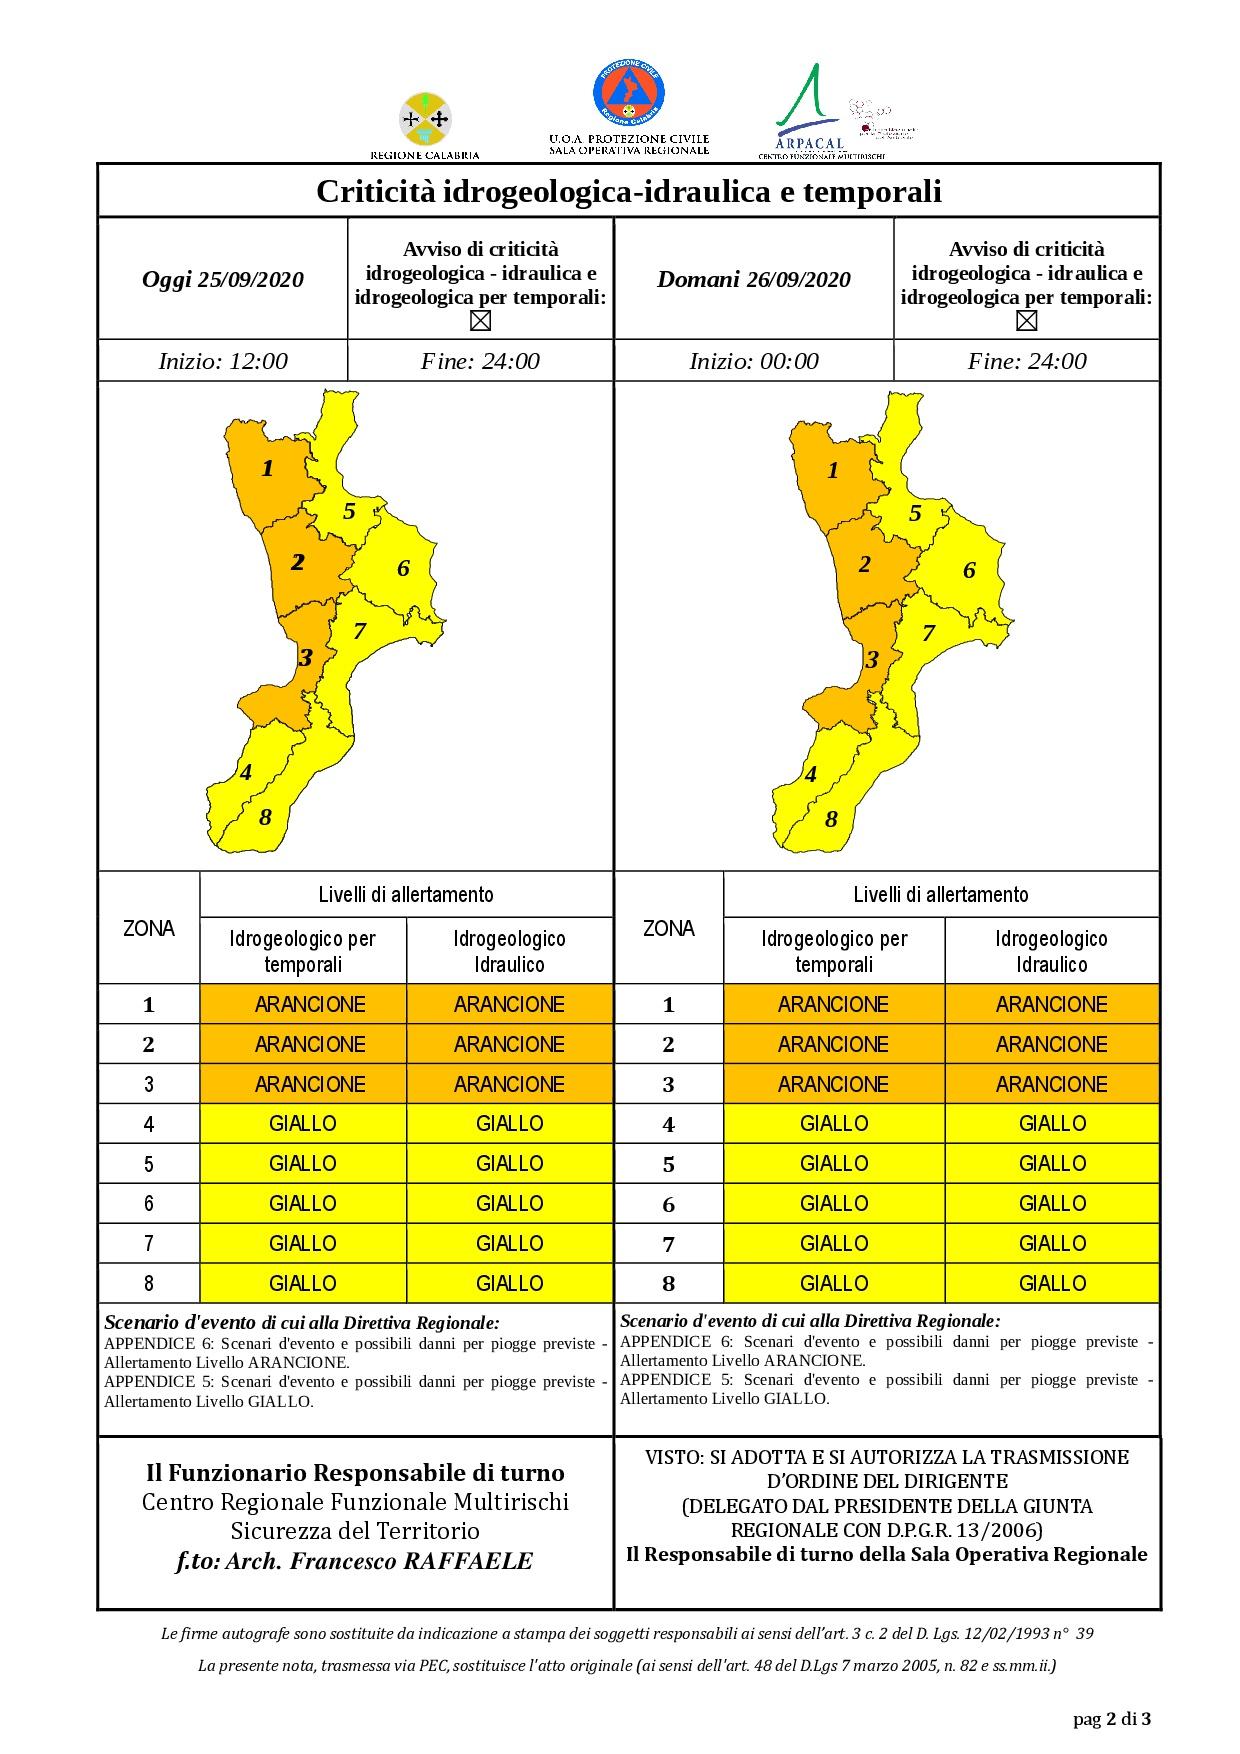 Criticità idrogeologica-idraulica e temporali in Calabria 25-09-2020